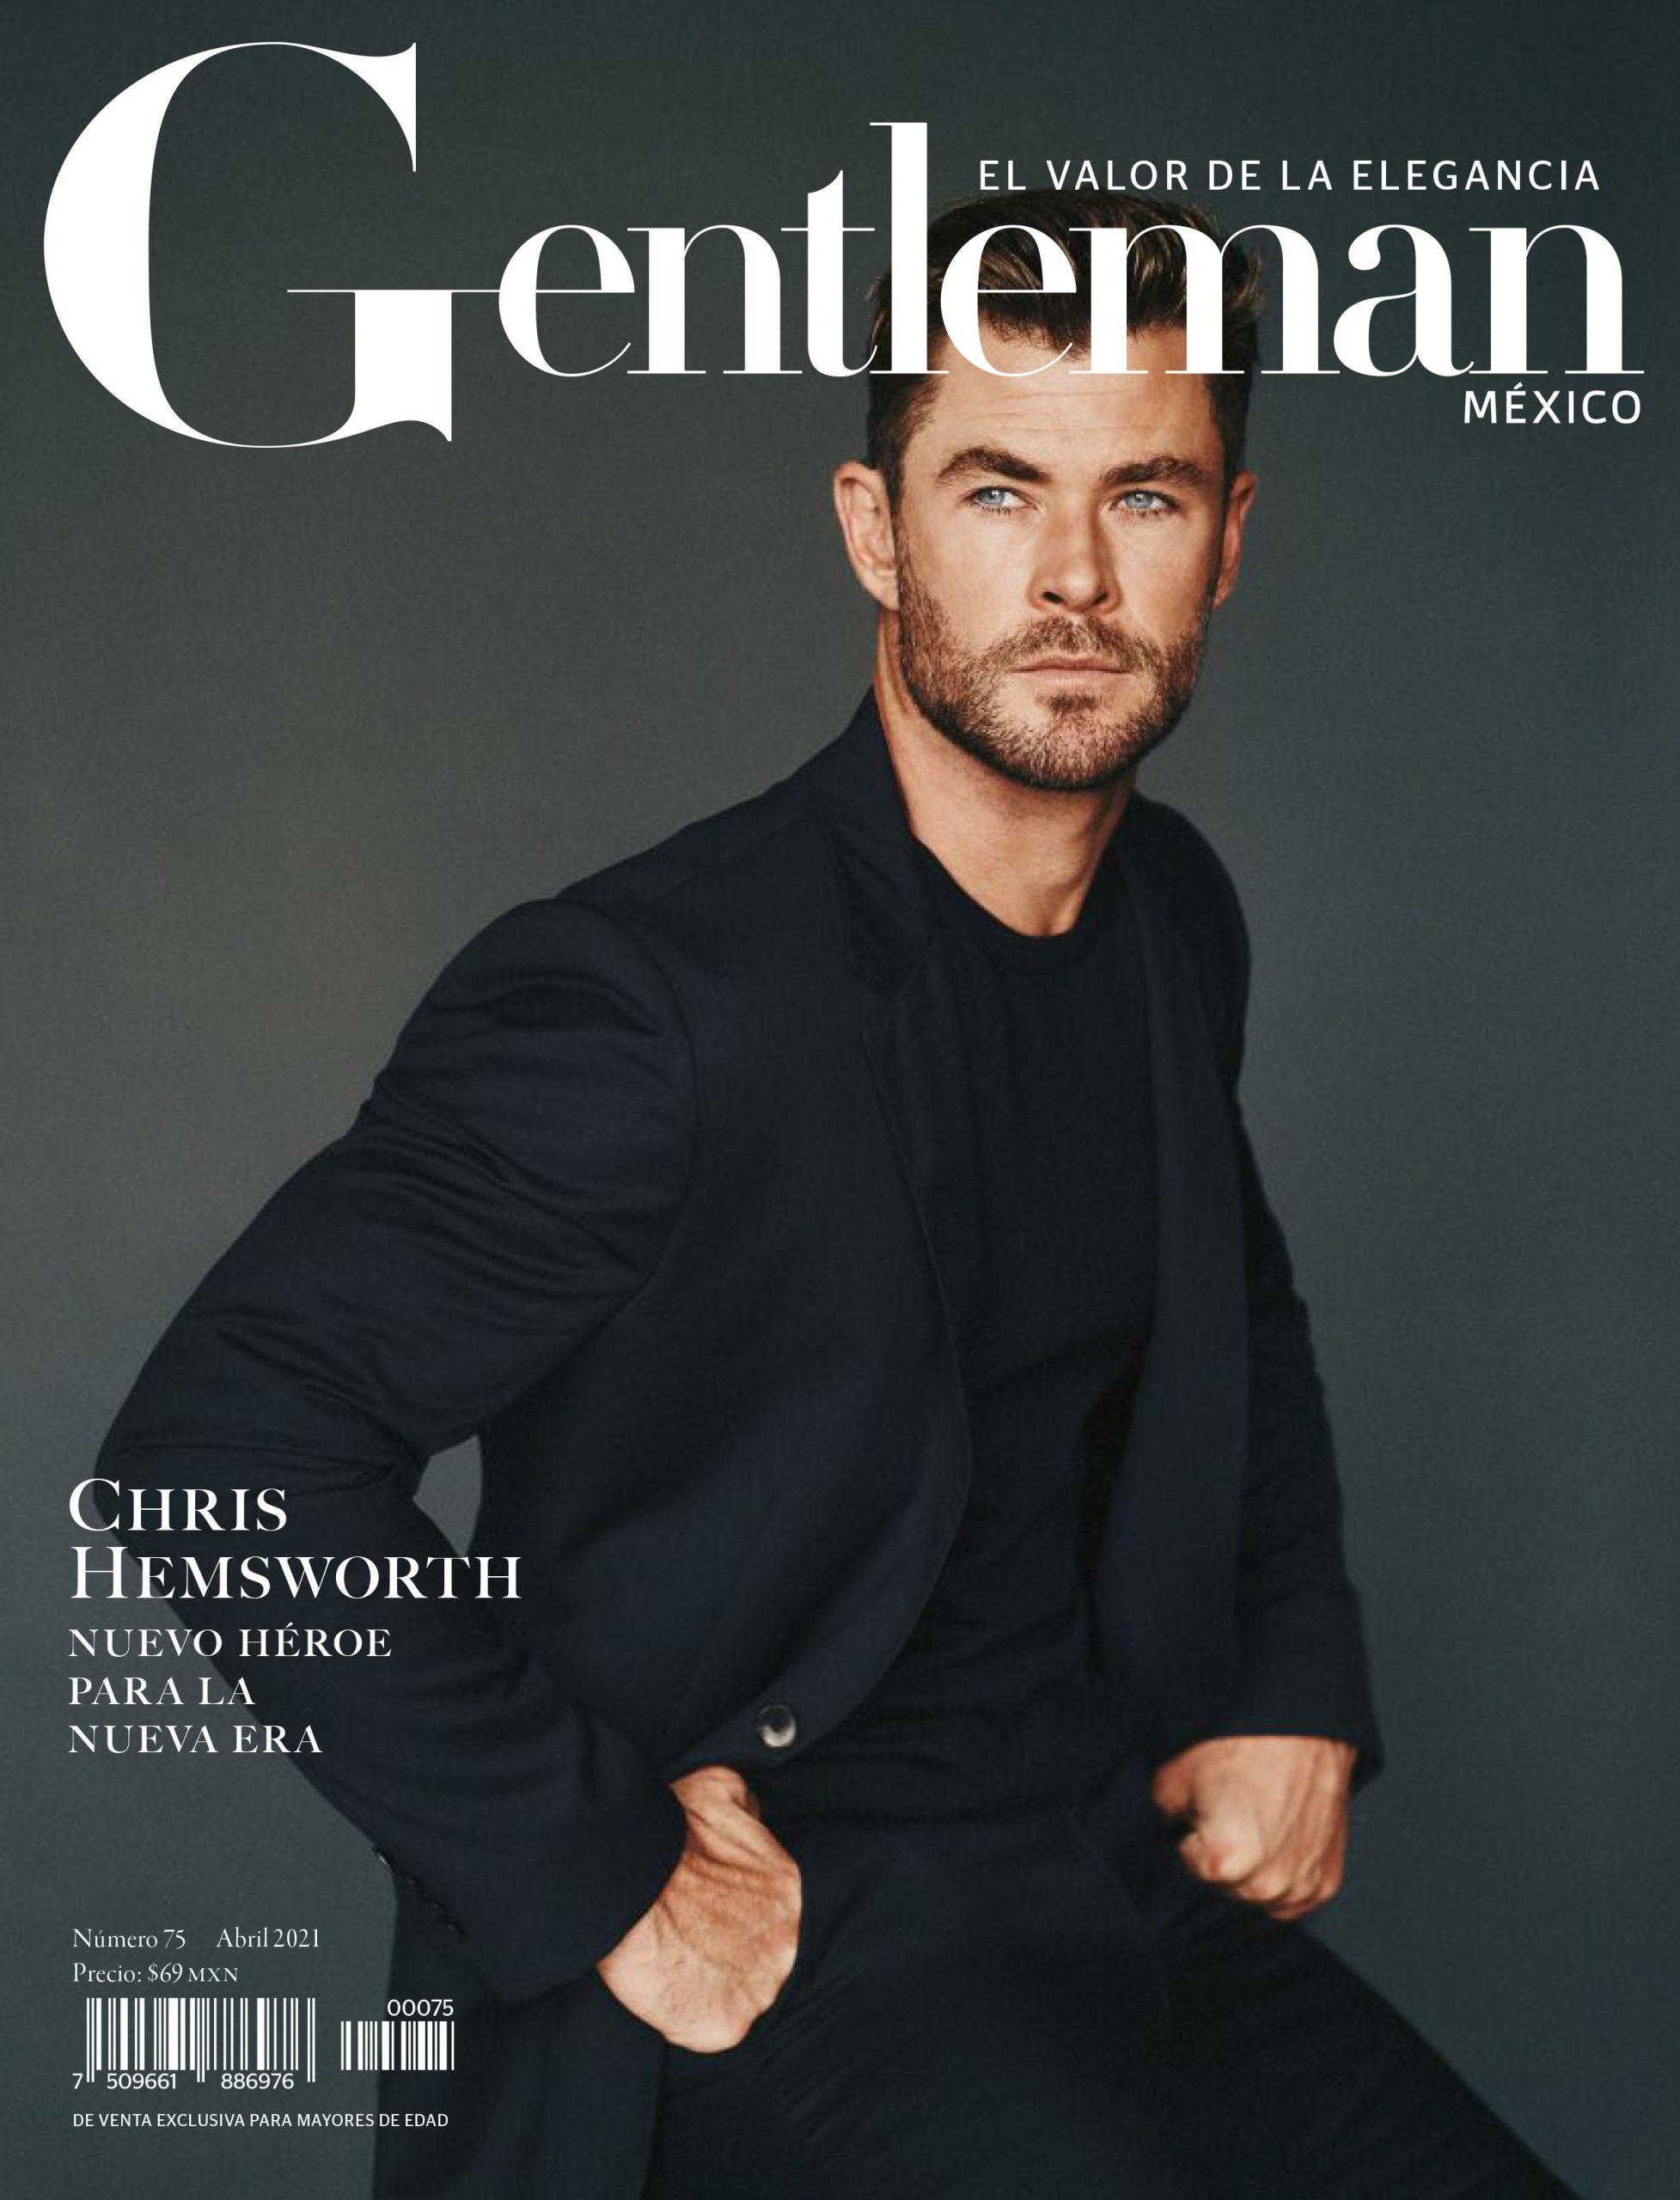 Chris Hemsworth, hero for a new era